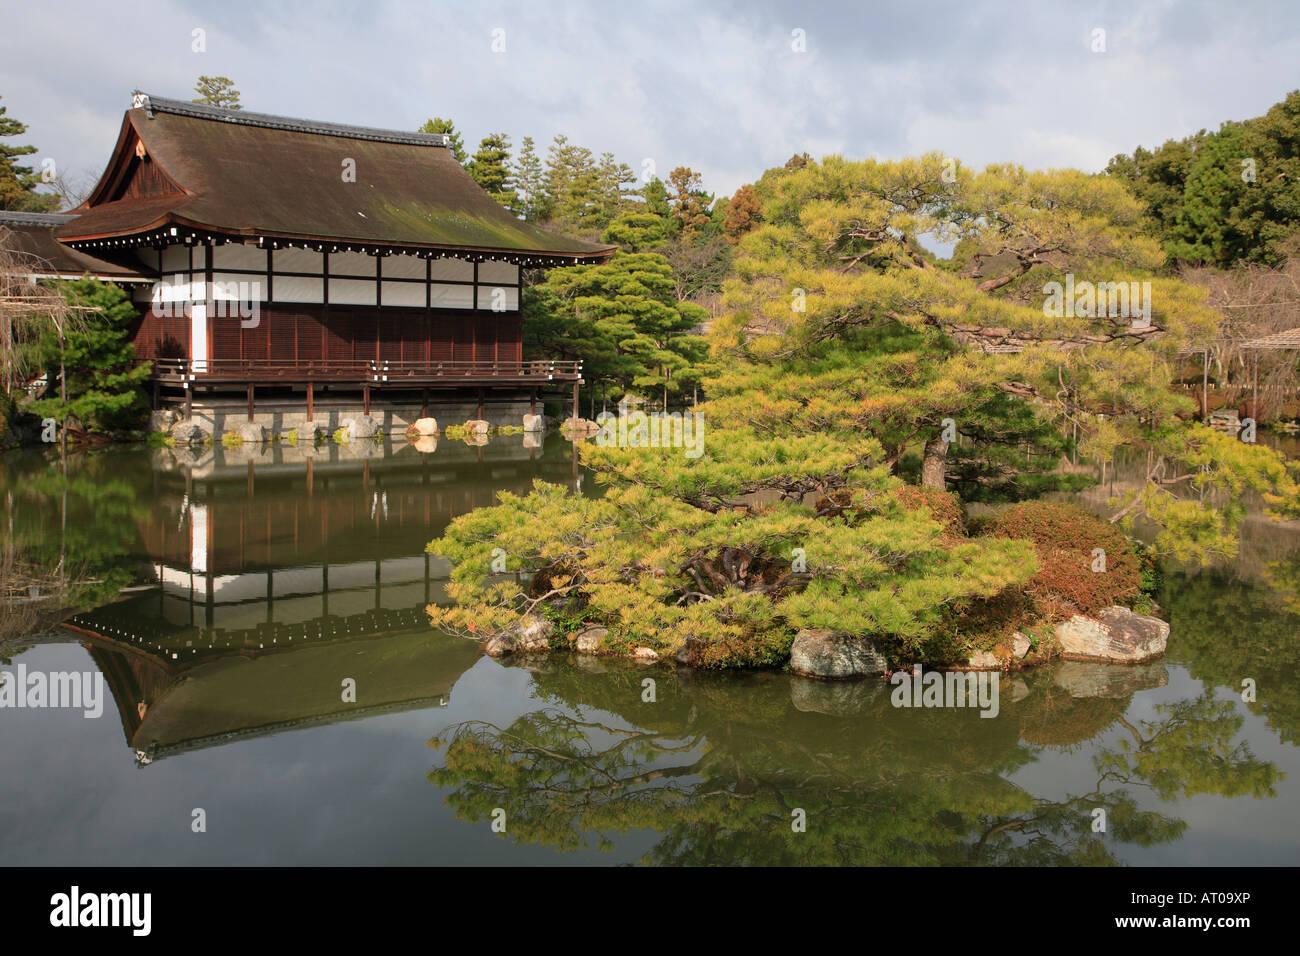 Japan Kansai Kyoto garden of Heian Shrine Stock Photo: 16160013 - Alamy